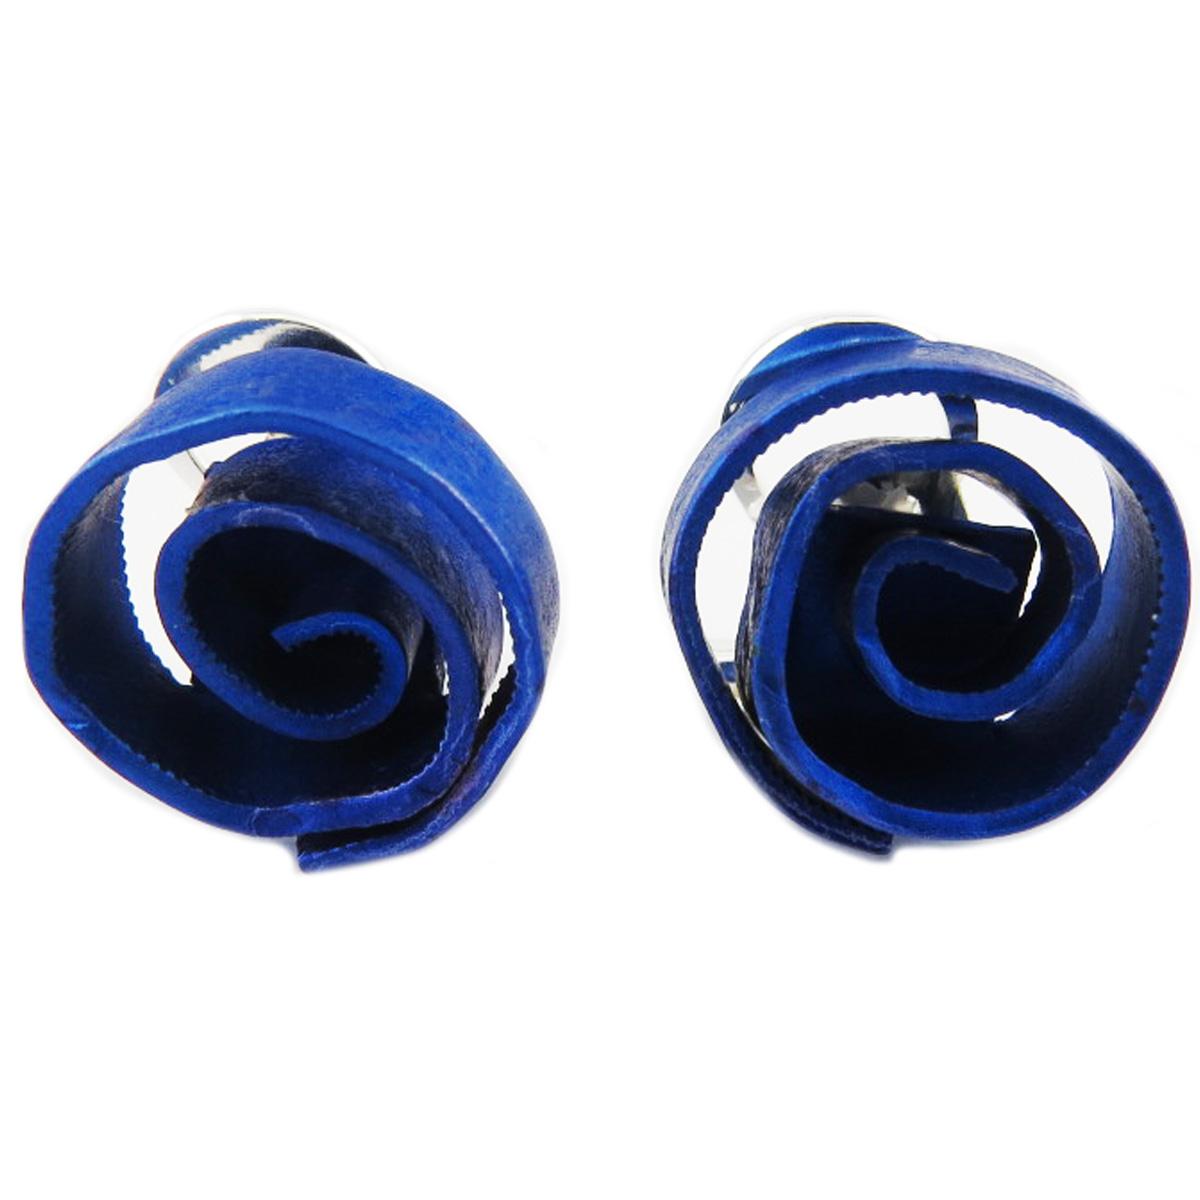 Clips / boucles d\'oreilles artisanales \'Aluminirock\' bleu - 15 cm - [R1236]